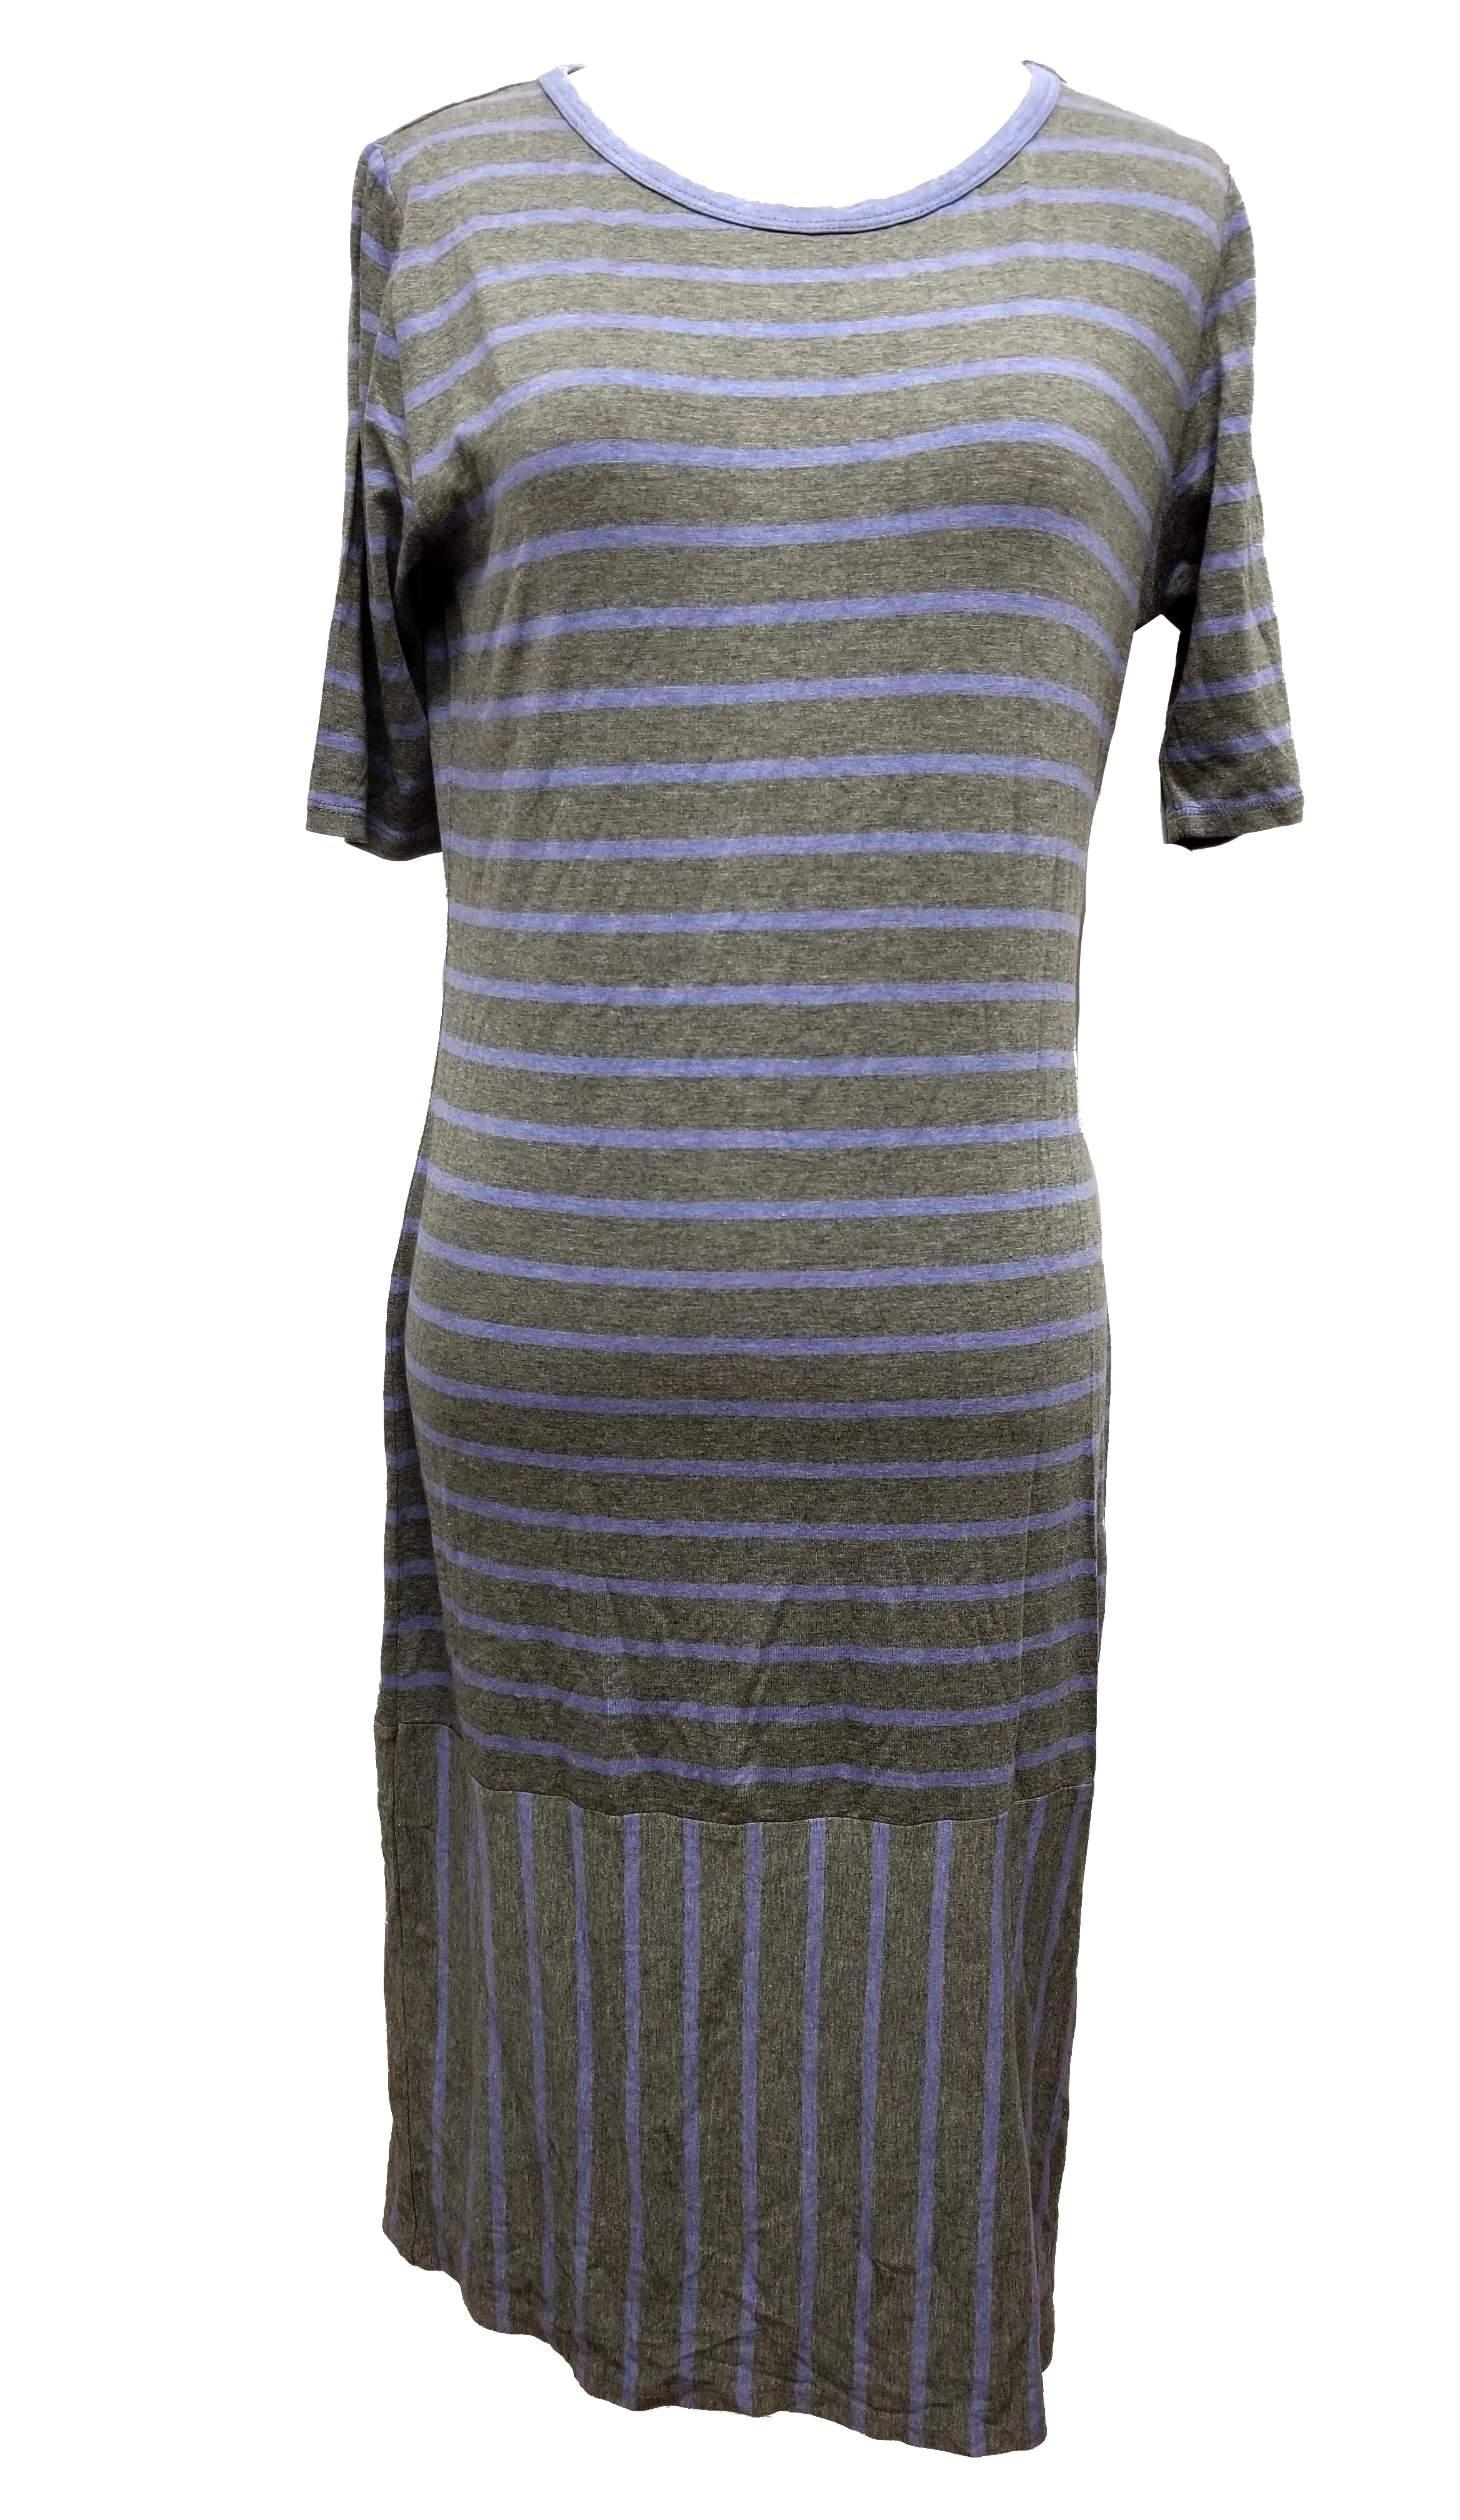 New LulaRoe Julia Dress Medium grey gray blue heathered solid color beautiful